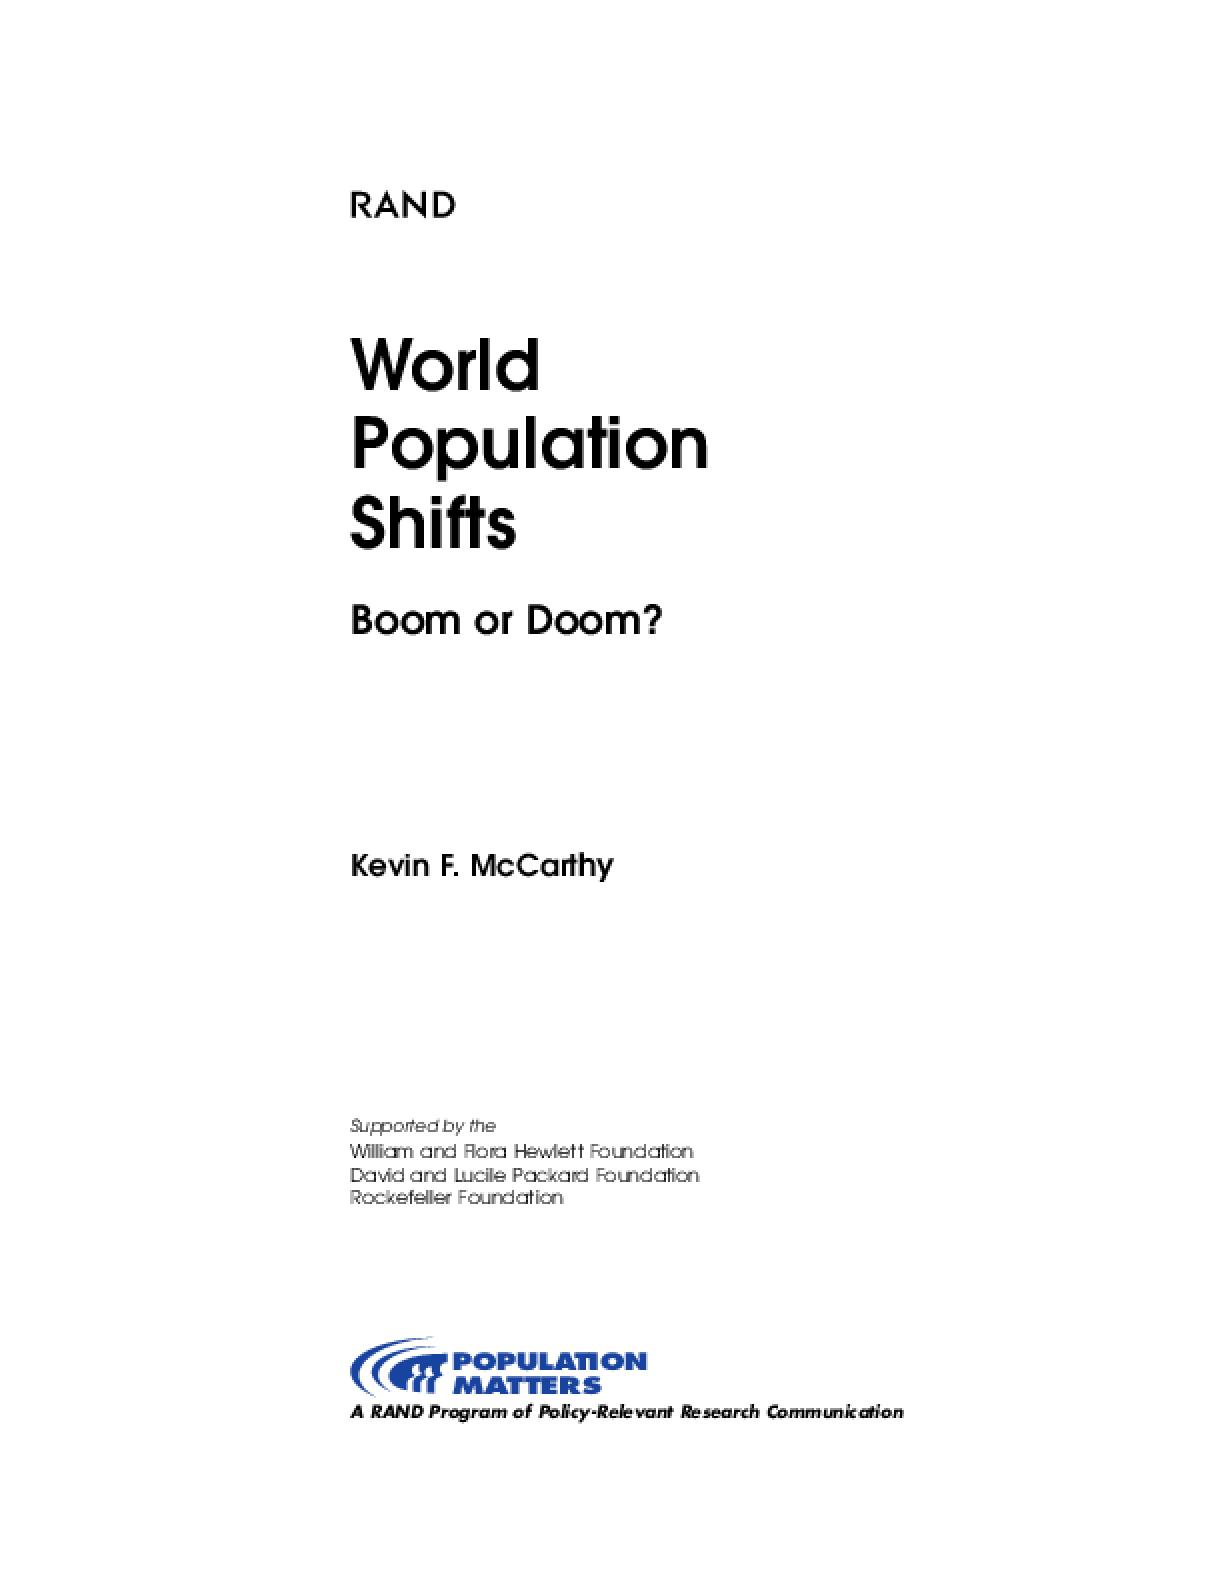 World Population Shifts: Boom or Doom?